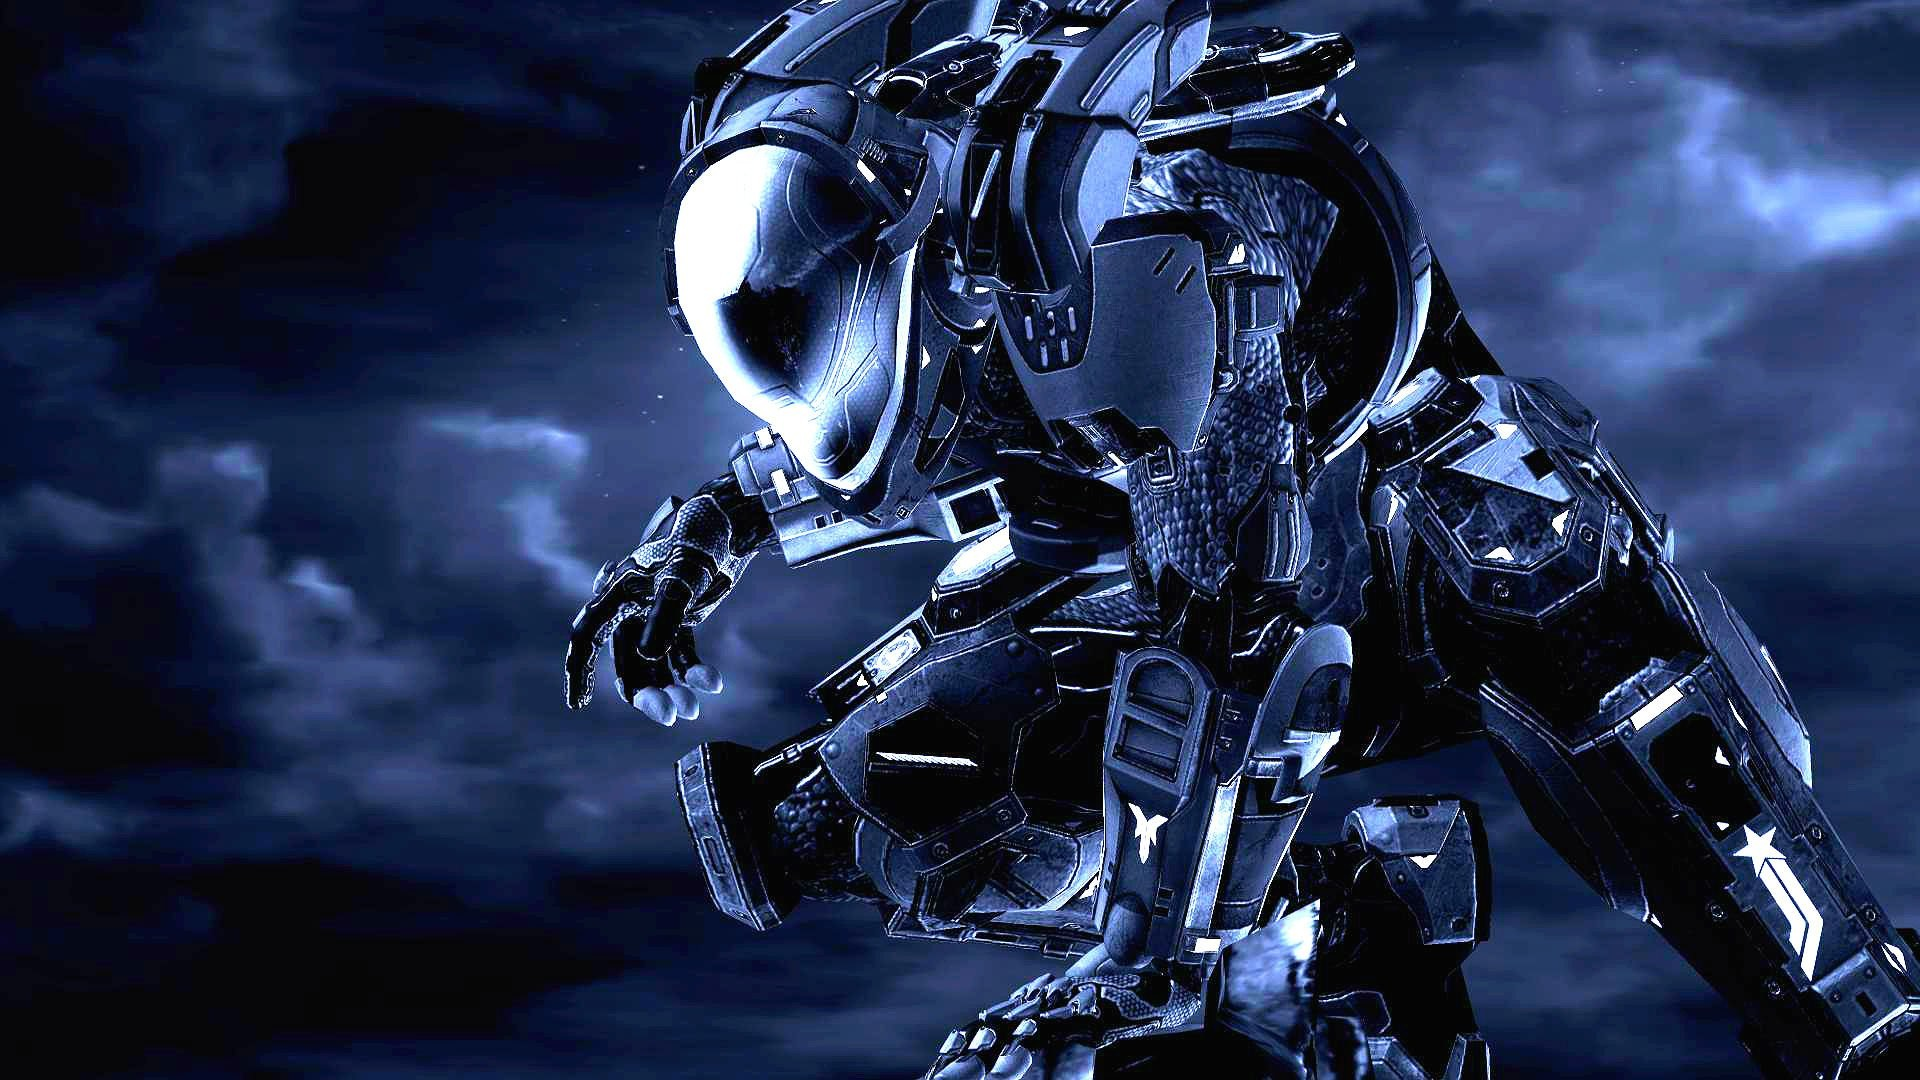 Halo elite wallpaper 74 images - Halo 5 screensaver ...